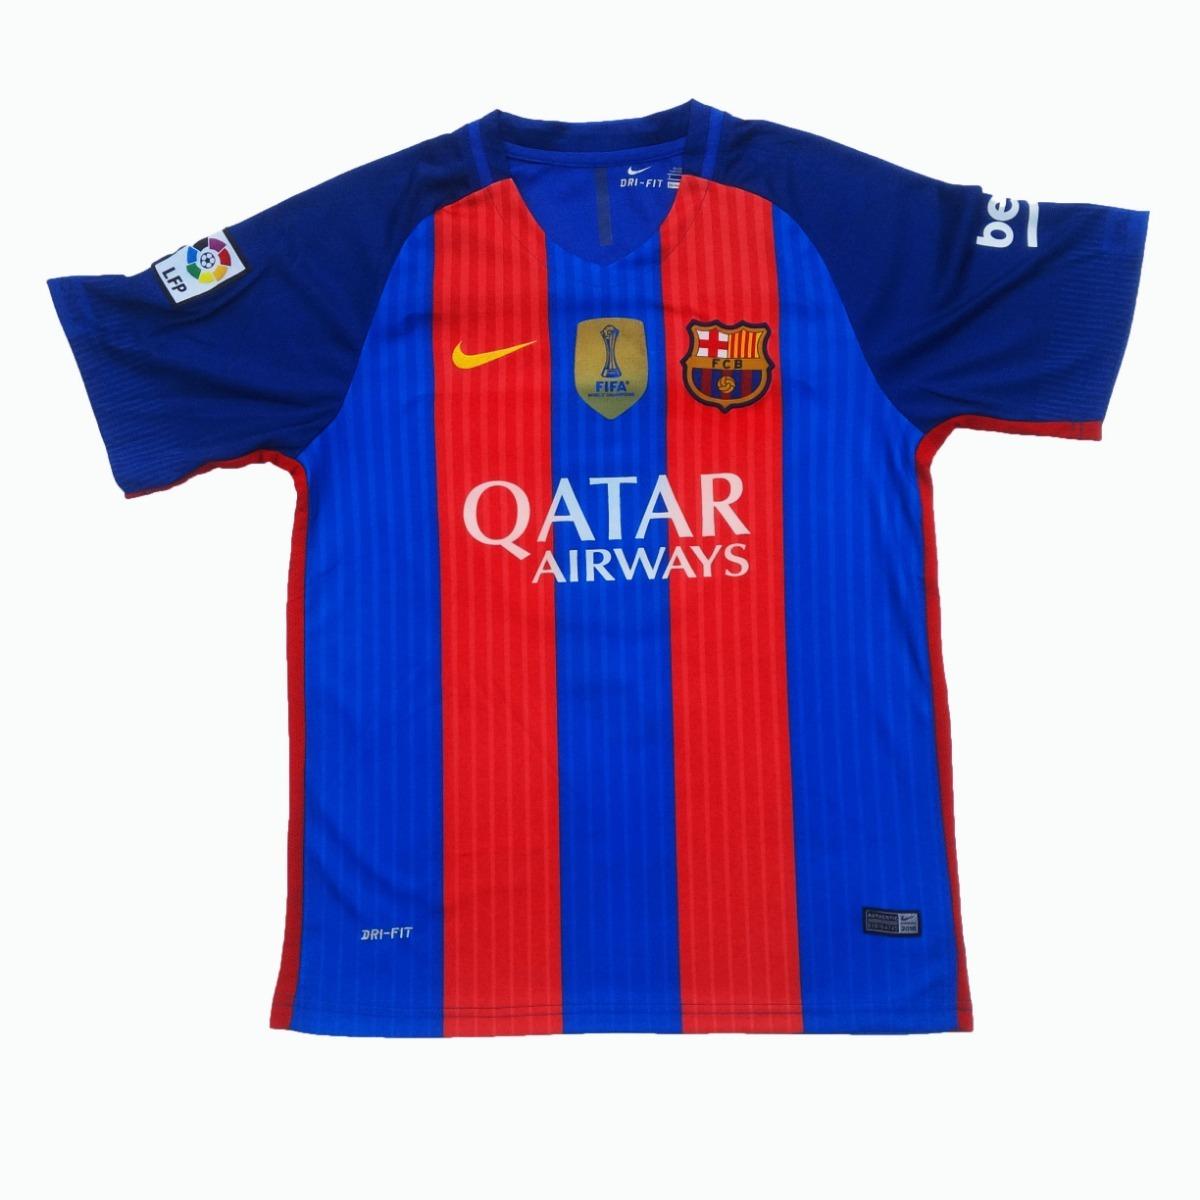 15ce4f44fd2a1 uniforme fc barcelona 2016-2017 local adultos messi suarez. Cargando zoom.